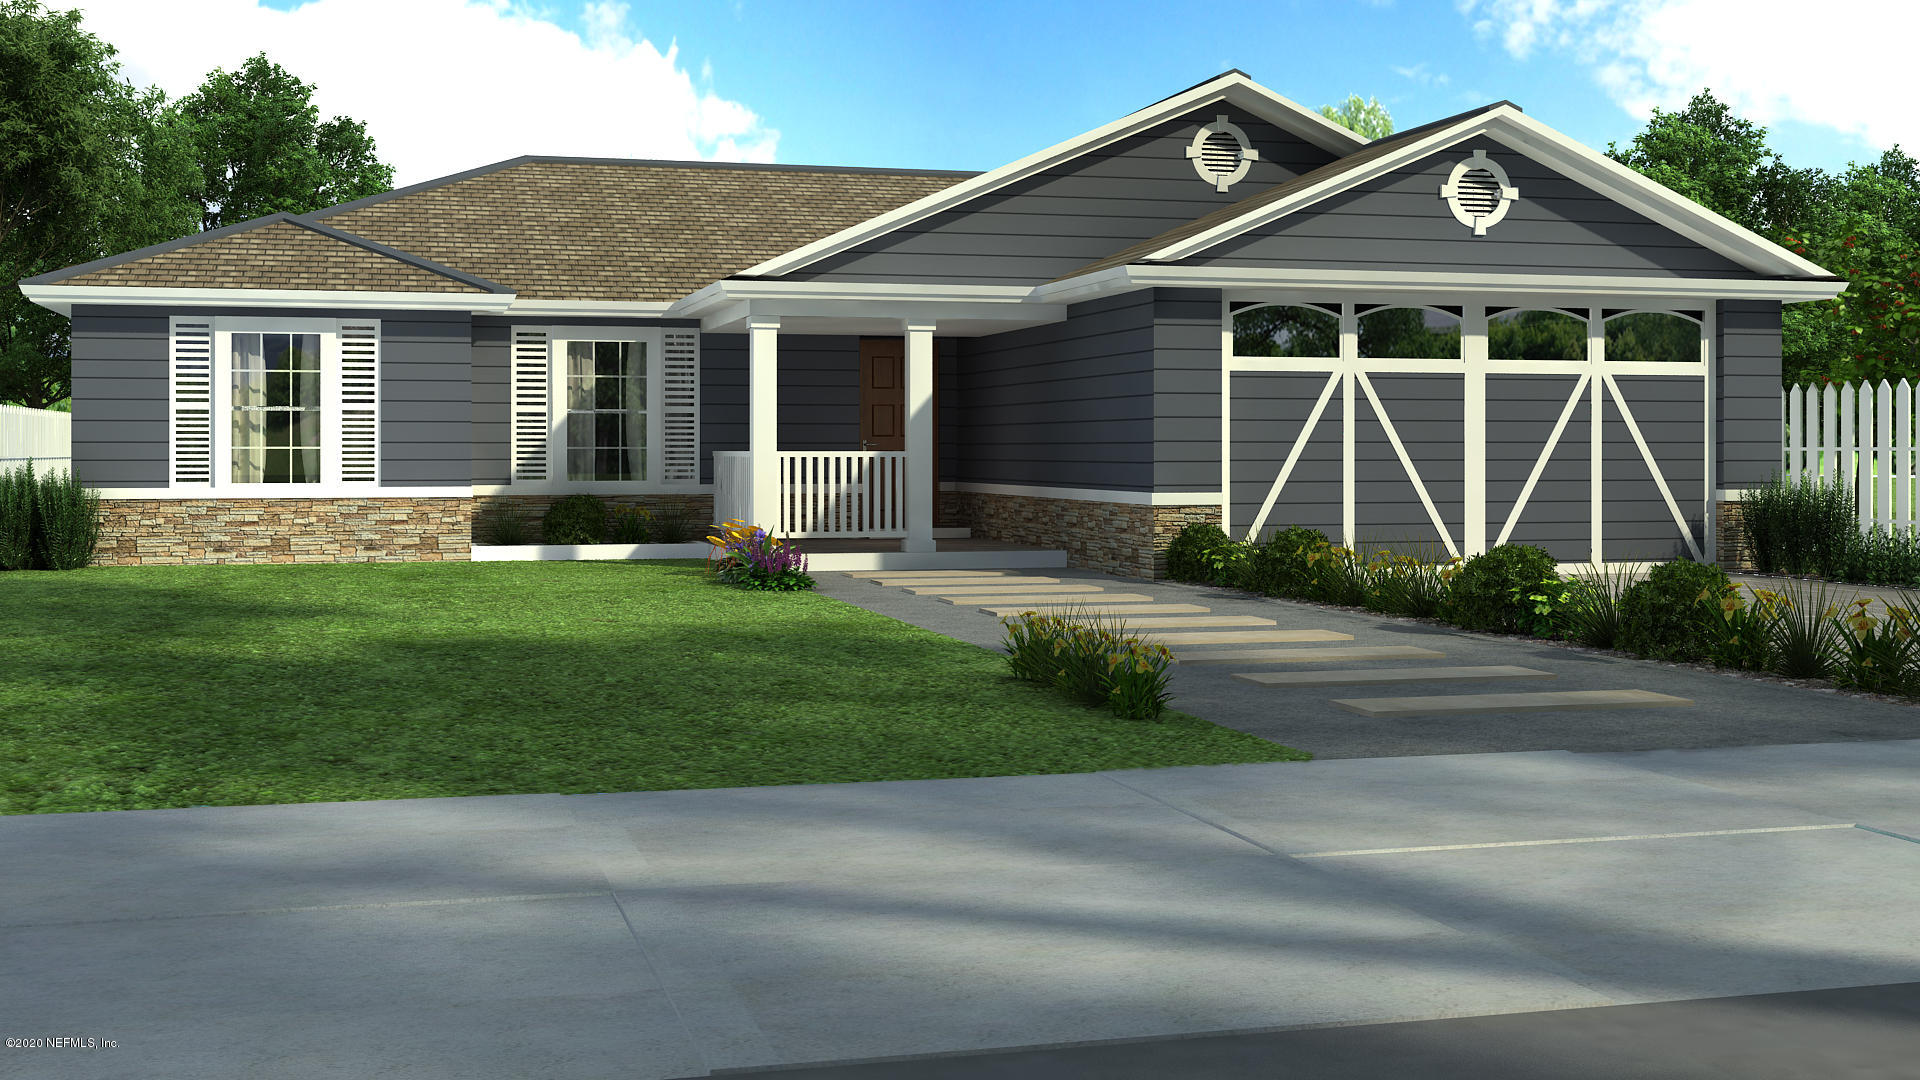 9706 SIBBALD, JACKSONVILLE, FLORIDA 32208, 3 Bedrooms Bedrooms, ,2 BathroomsBathrooms,Residential,For sale,SIBBALD,1054043